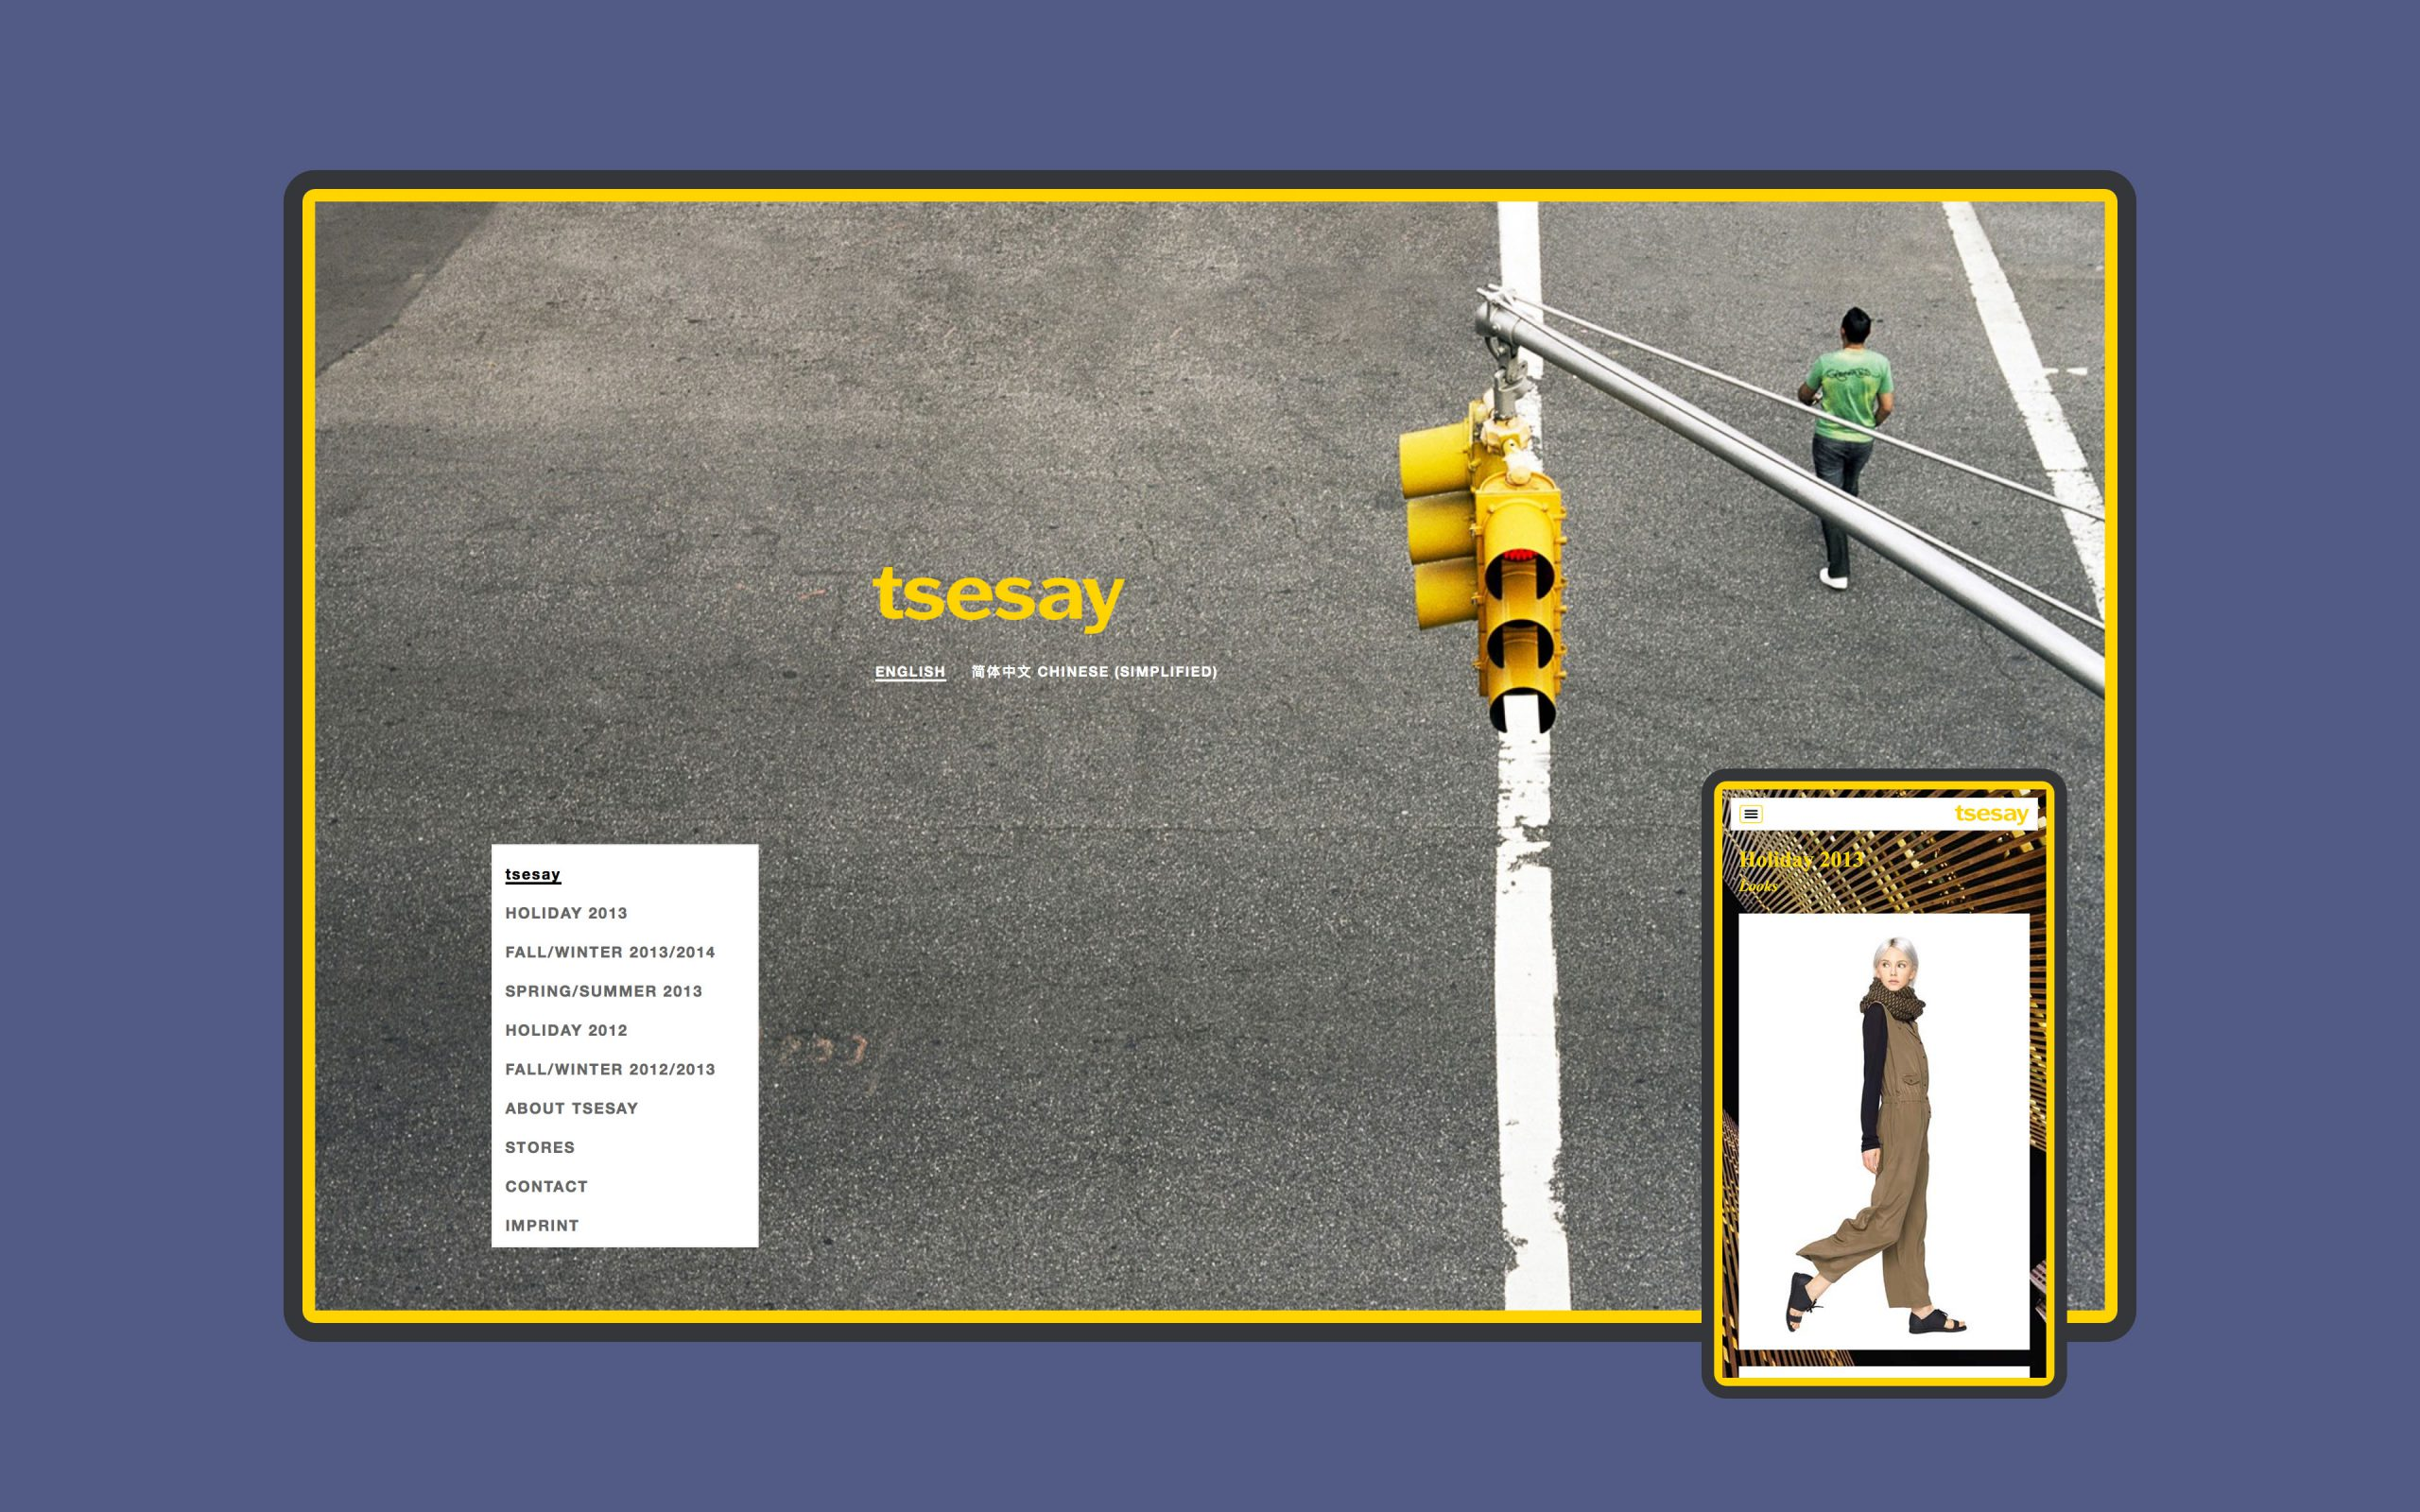 tsesay.com